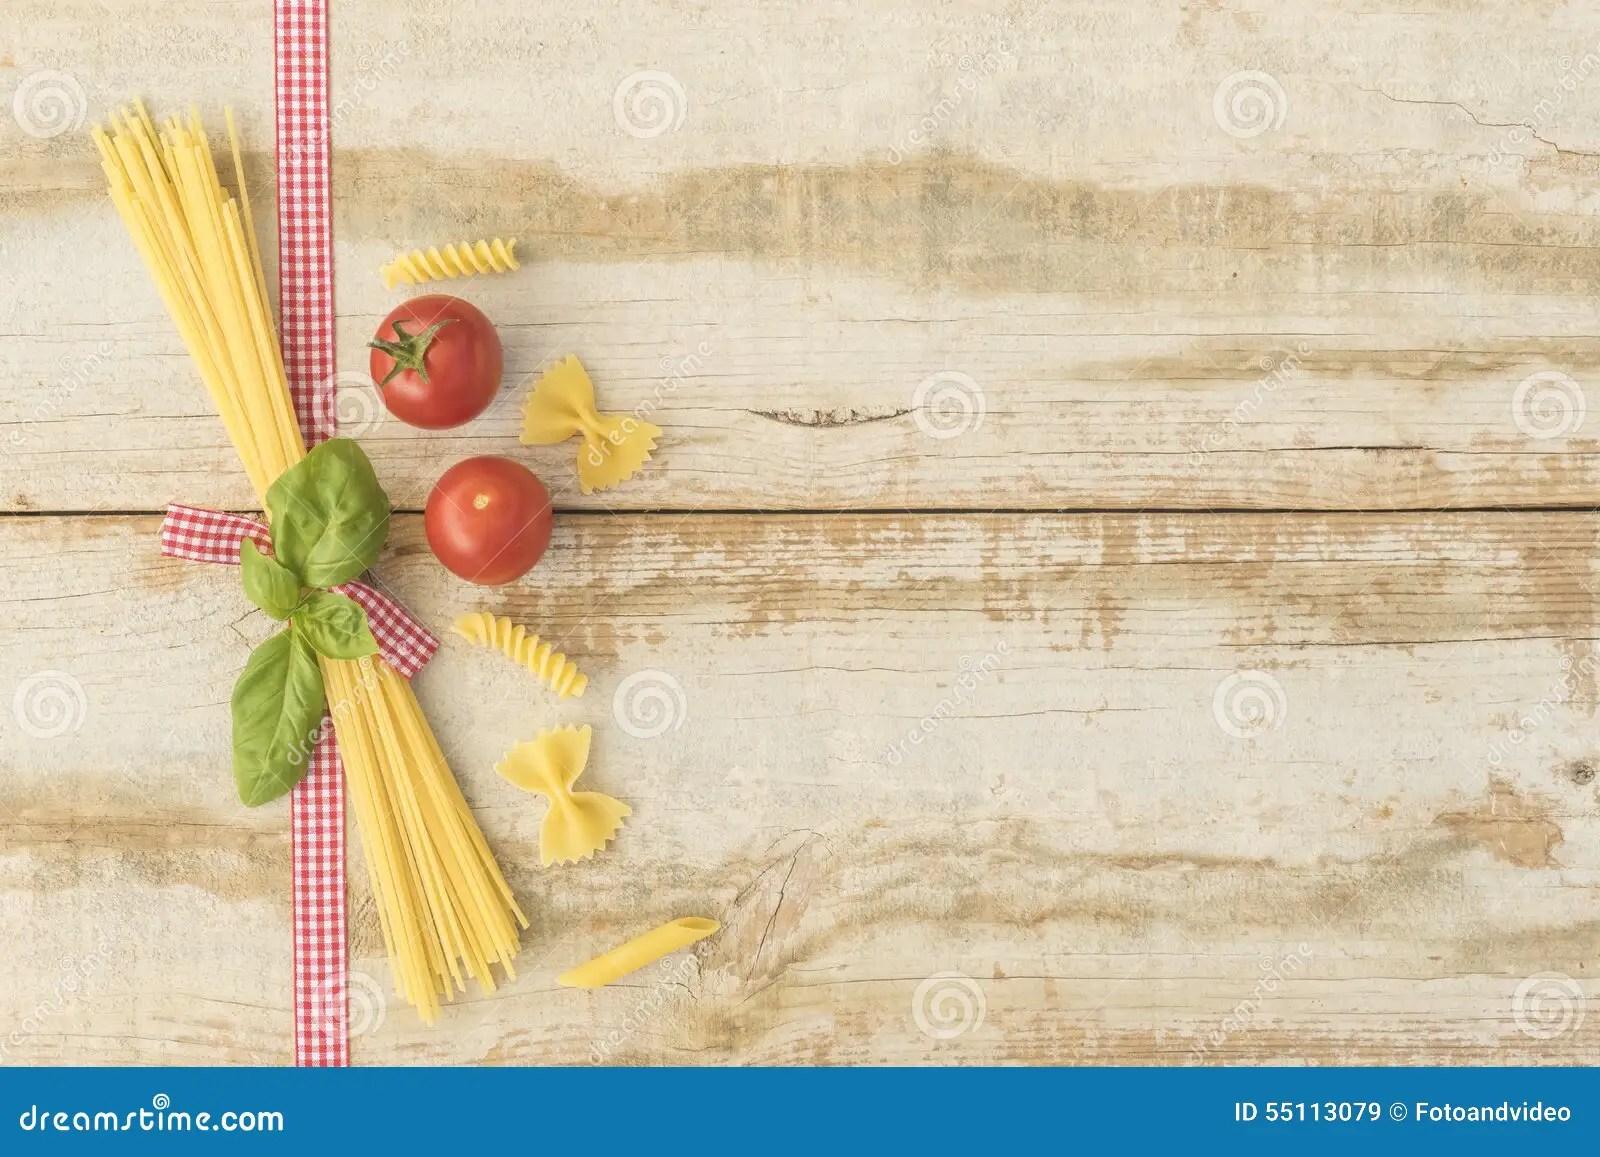 Italian Cooking Stock Photo Image 55113079